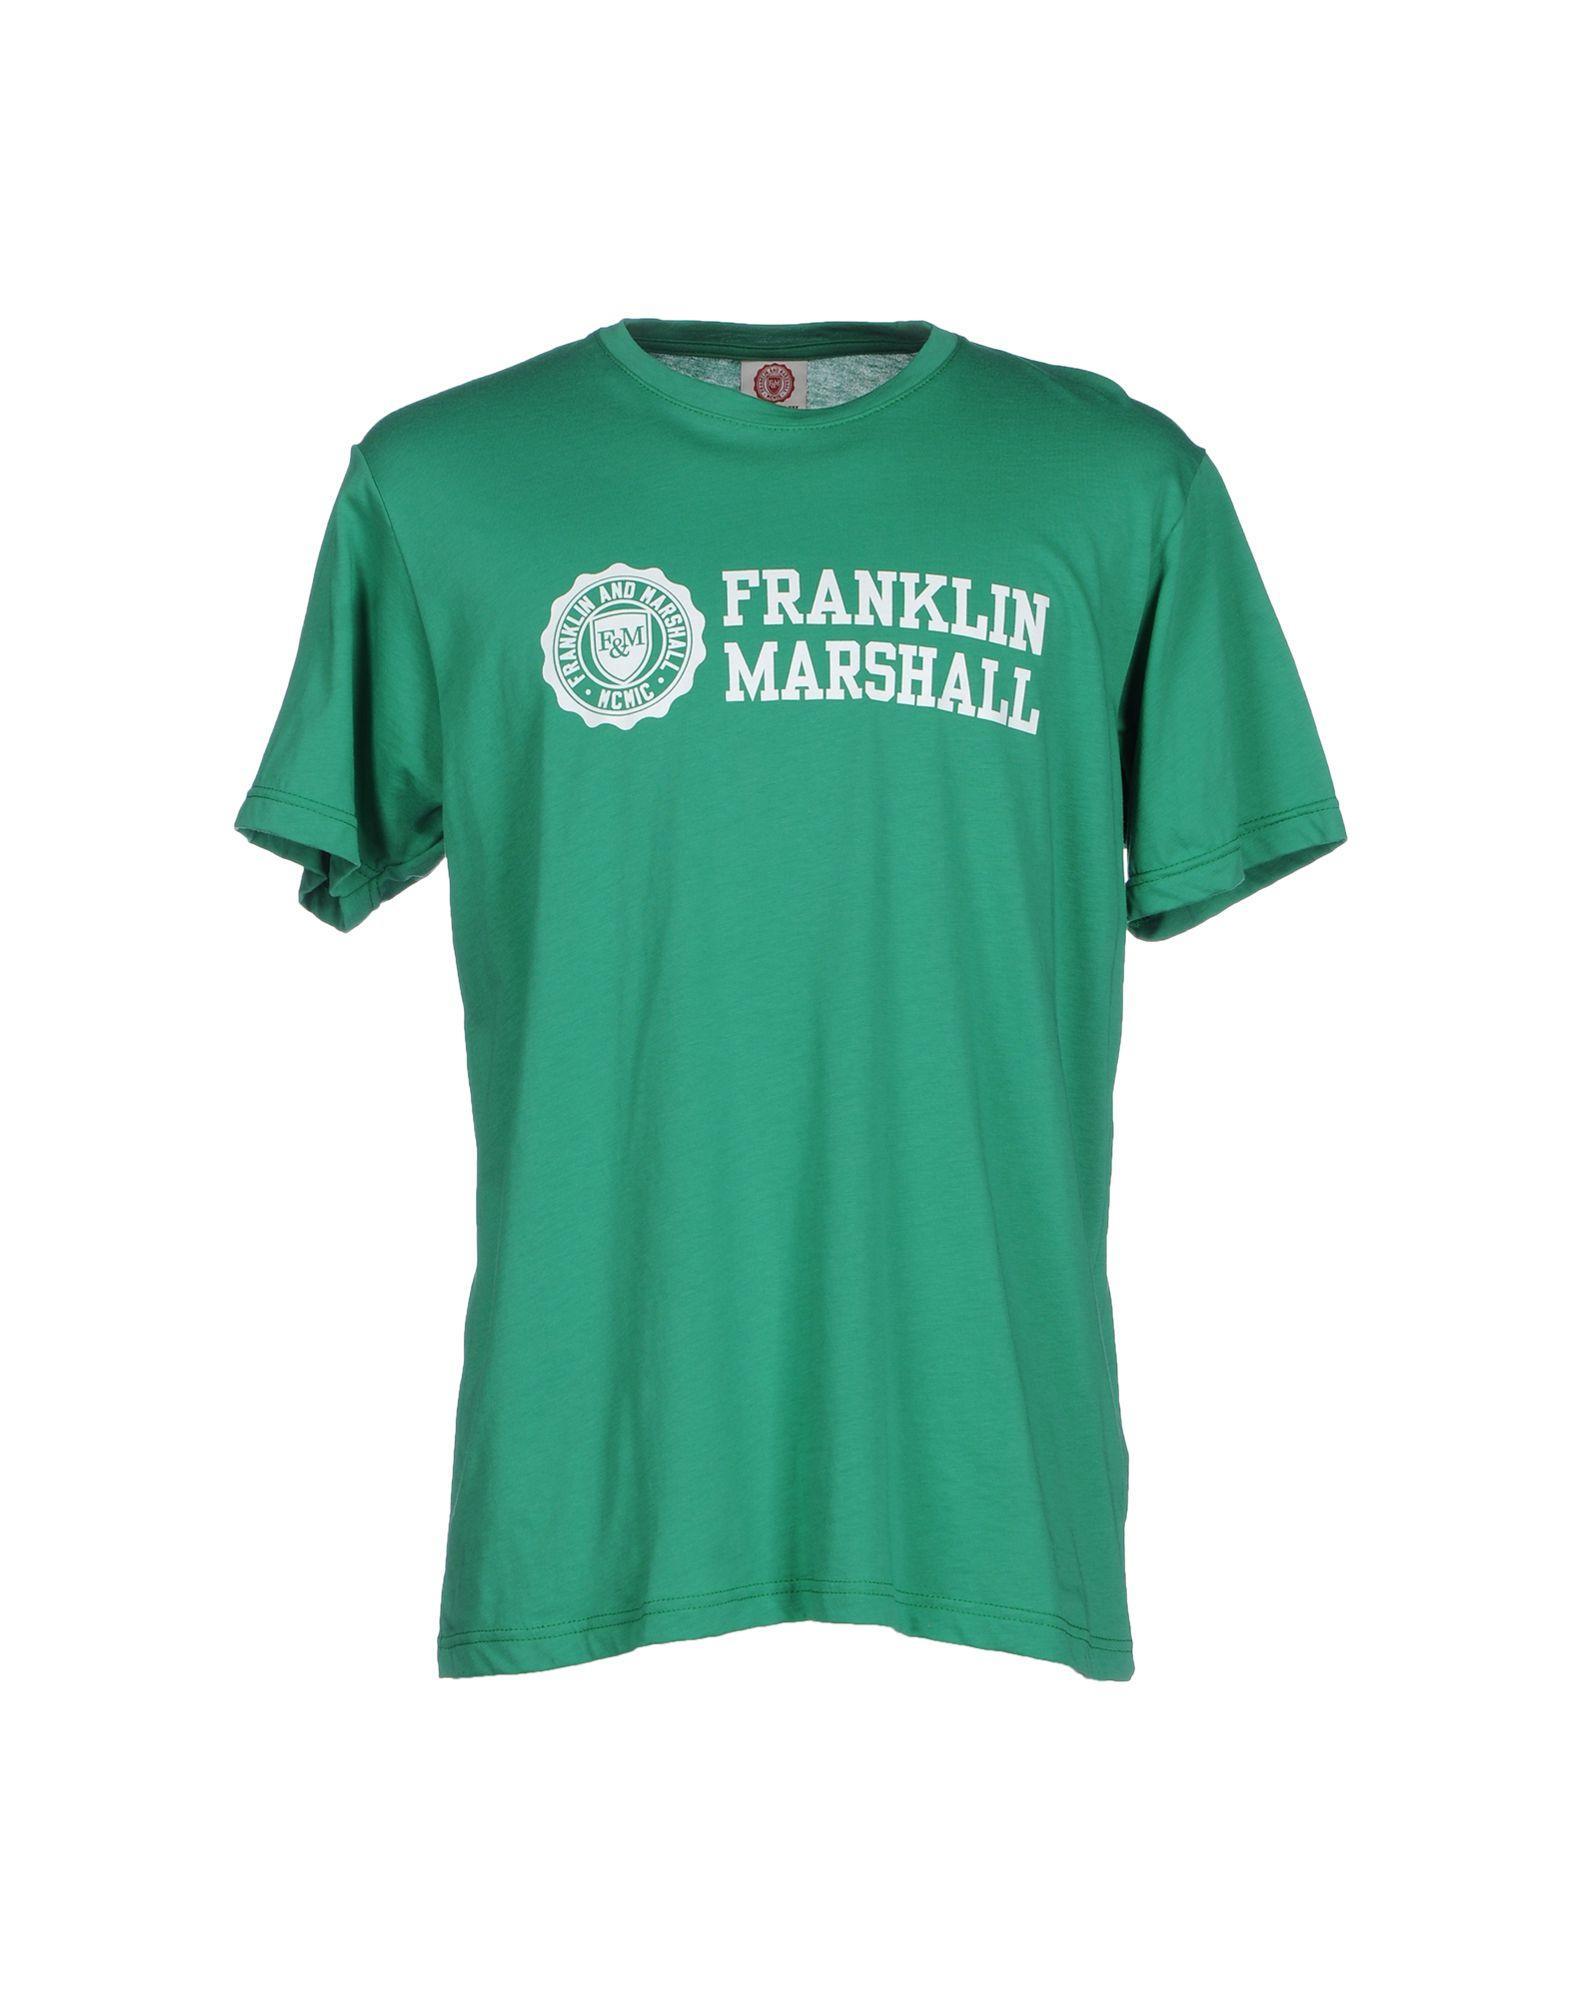 Lyst franklin marshall t shirt in green for men for T shirt printing mobile al